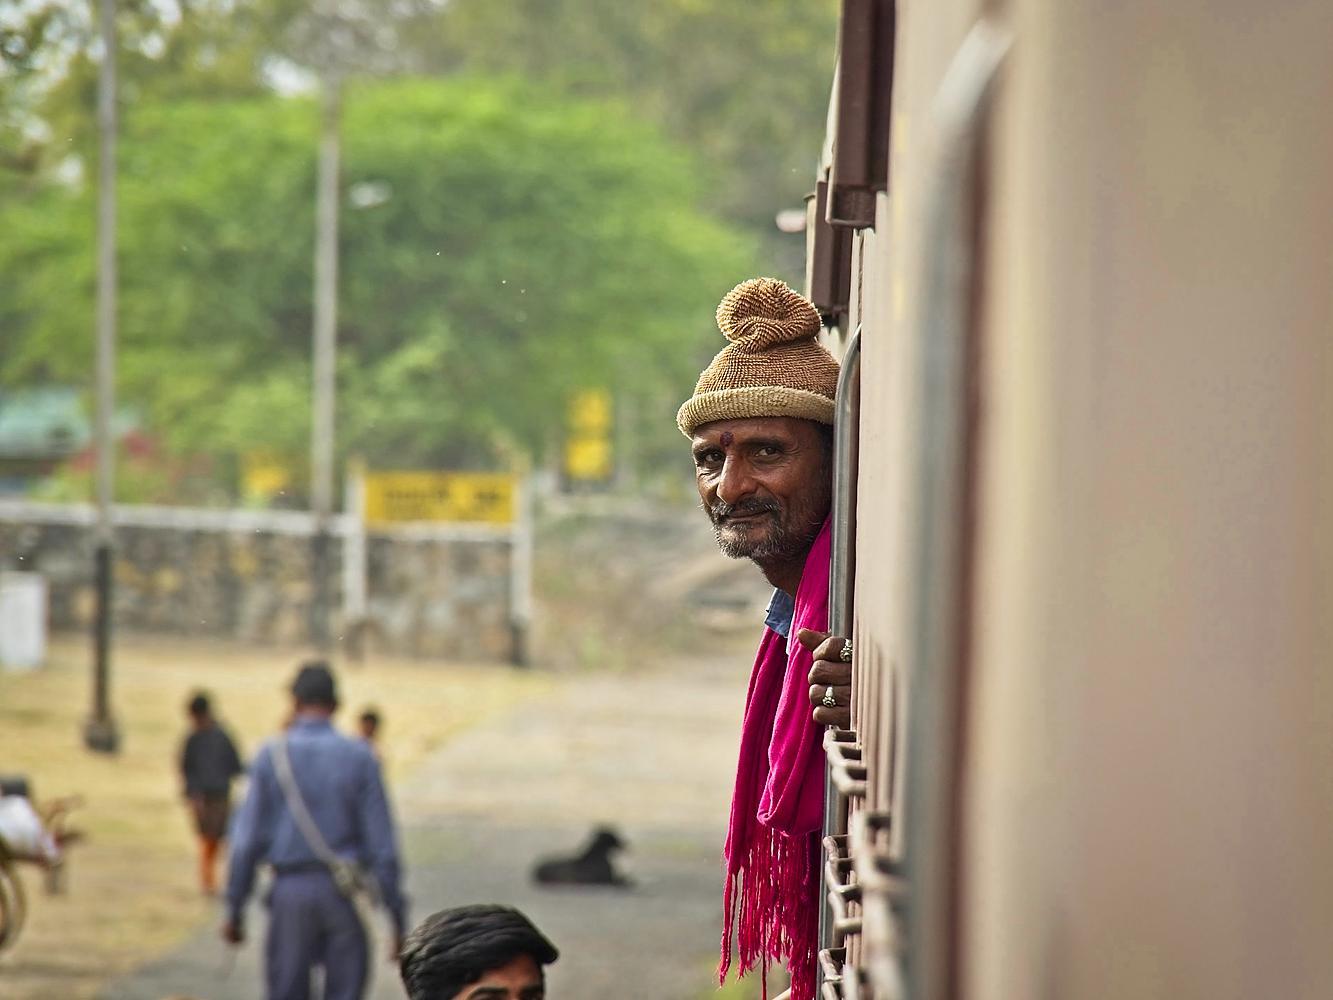 Standing on the train, Rajasthan by Sam Davis Photographer Professional travel portrait